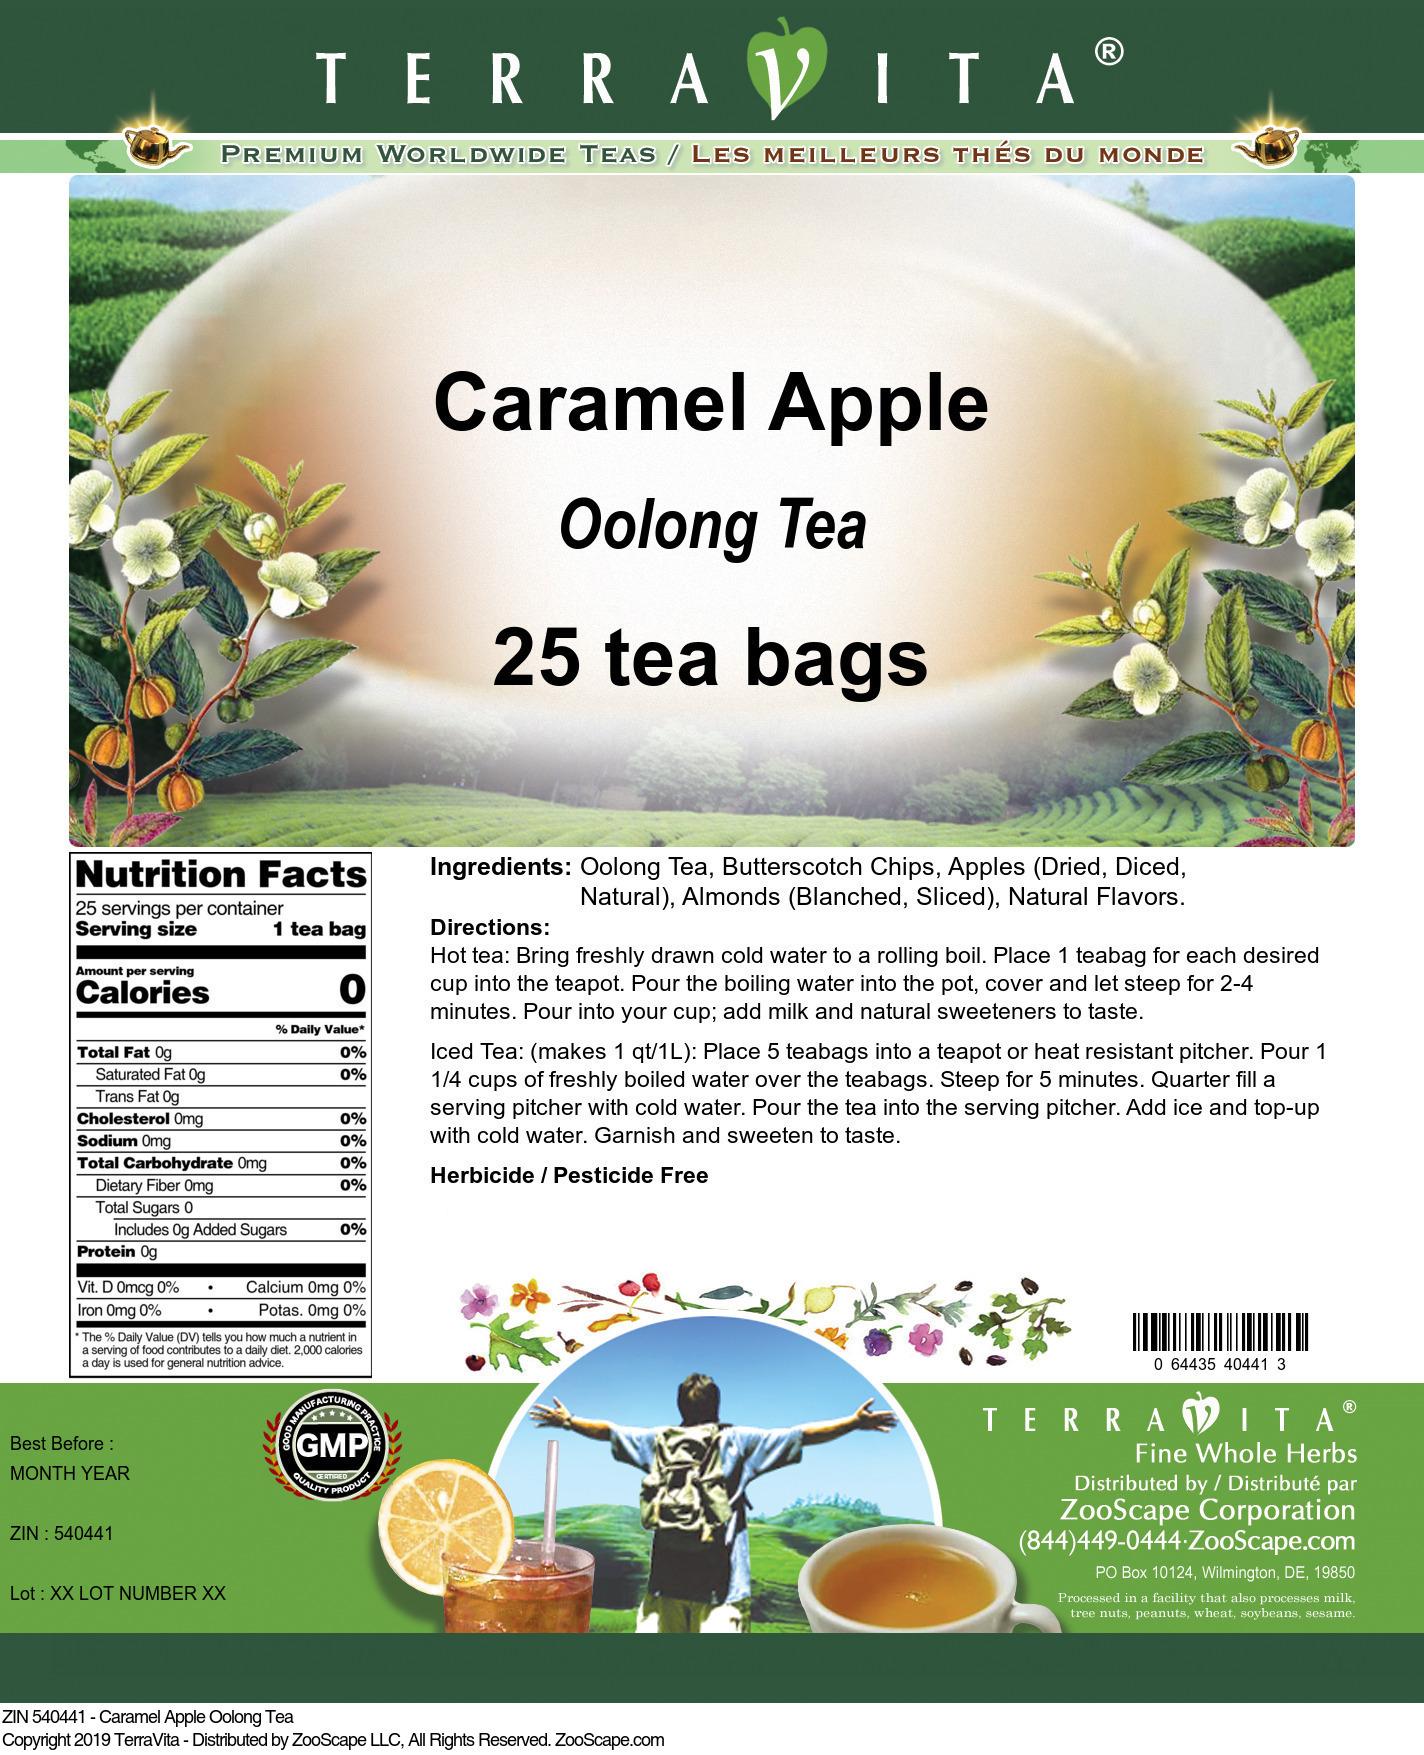 Caramel Apple Oolong Tea